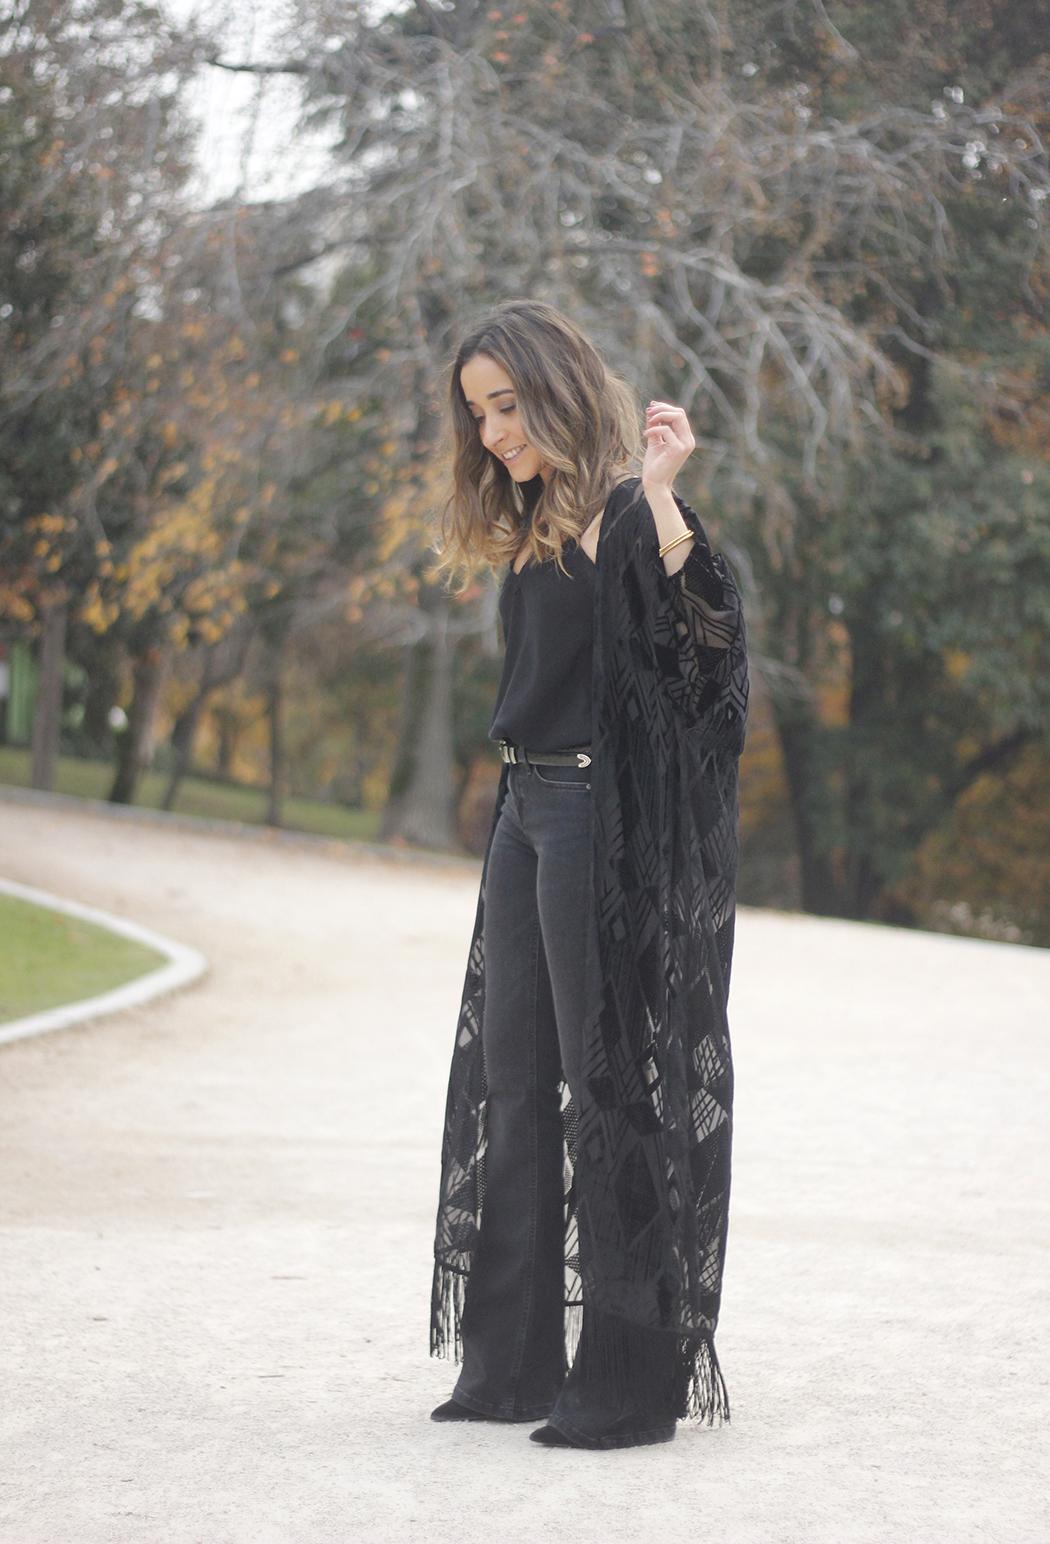 Black Kimono Black flared jeans outfit15